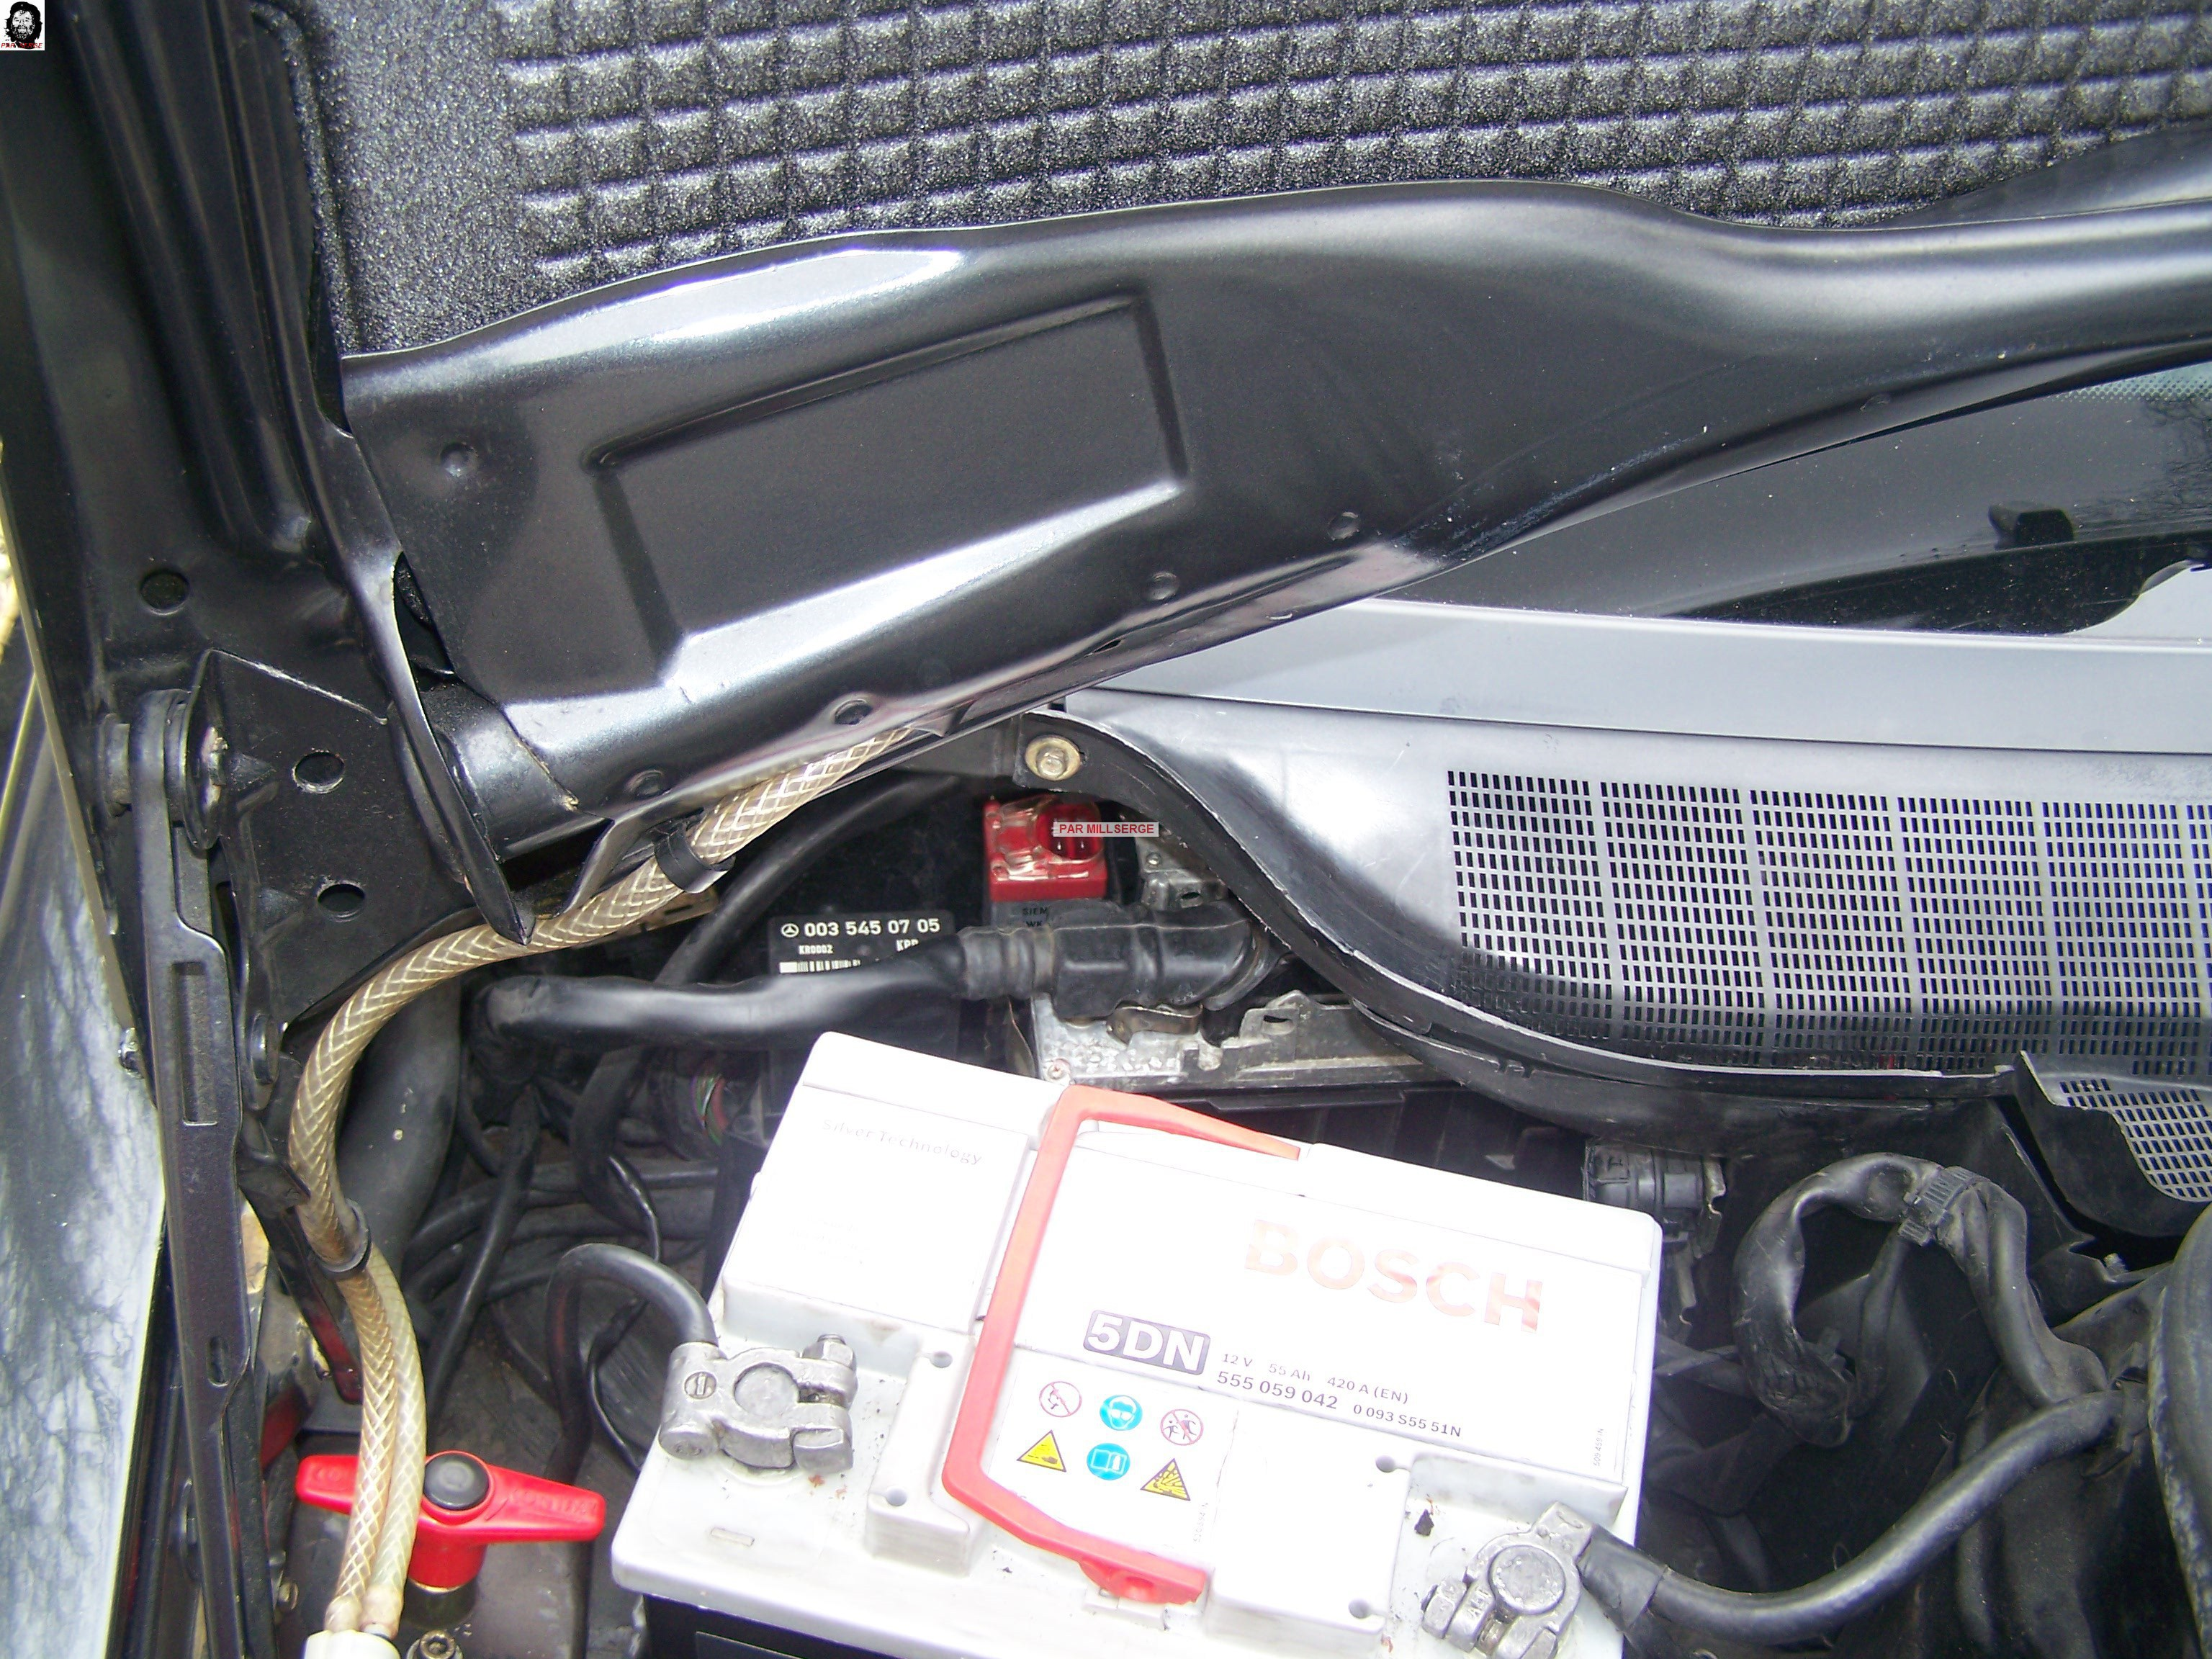 TUTO: Retrait d'une SERPI STAR MK 130-V 9840565Demontagebatteriepouraccderauxrelais